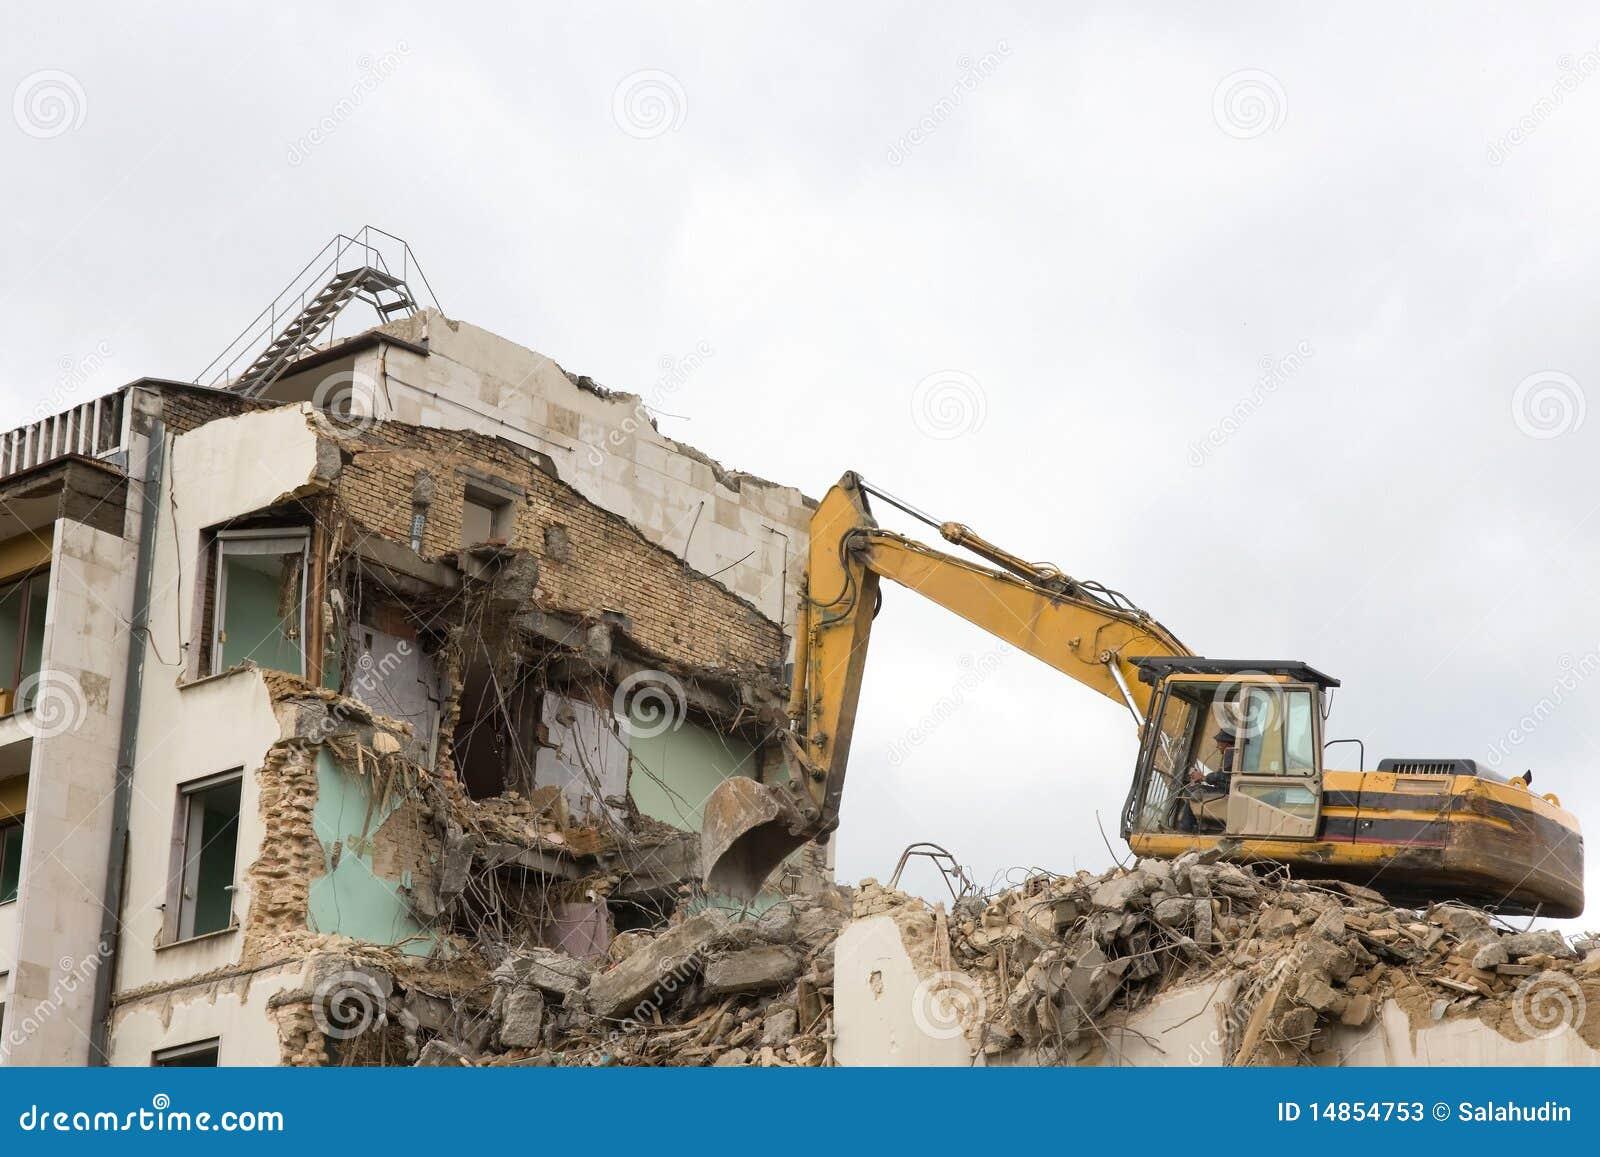 Excavator and destruction